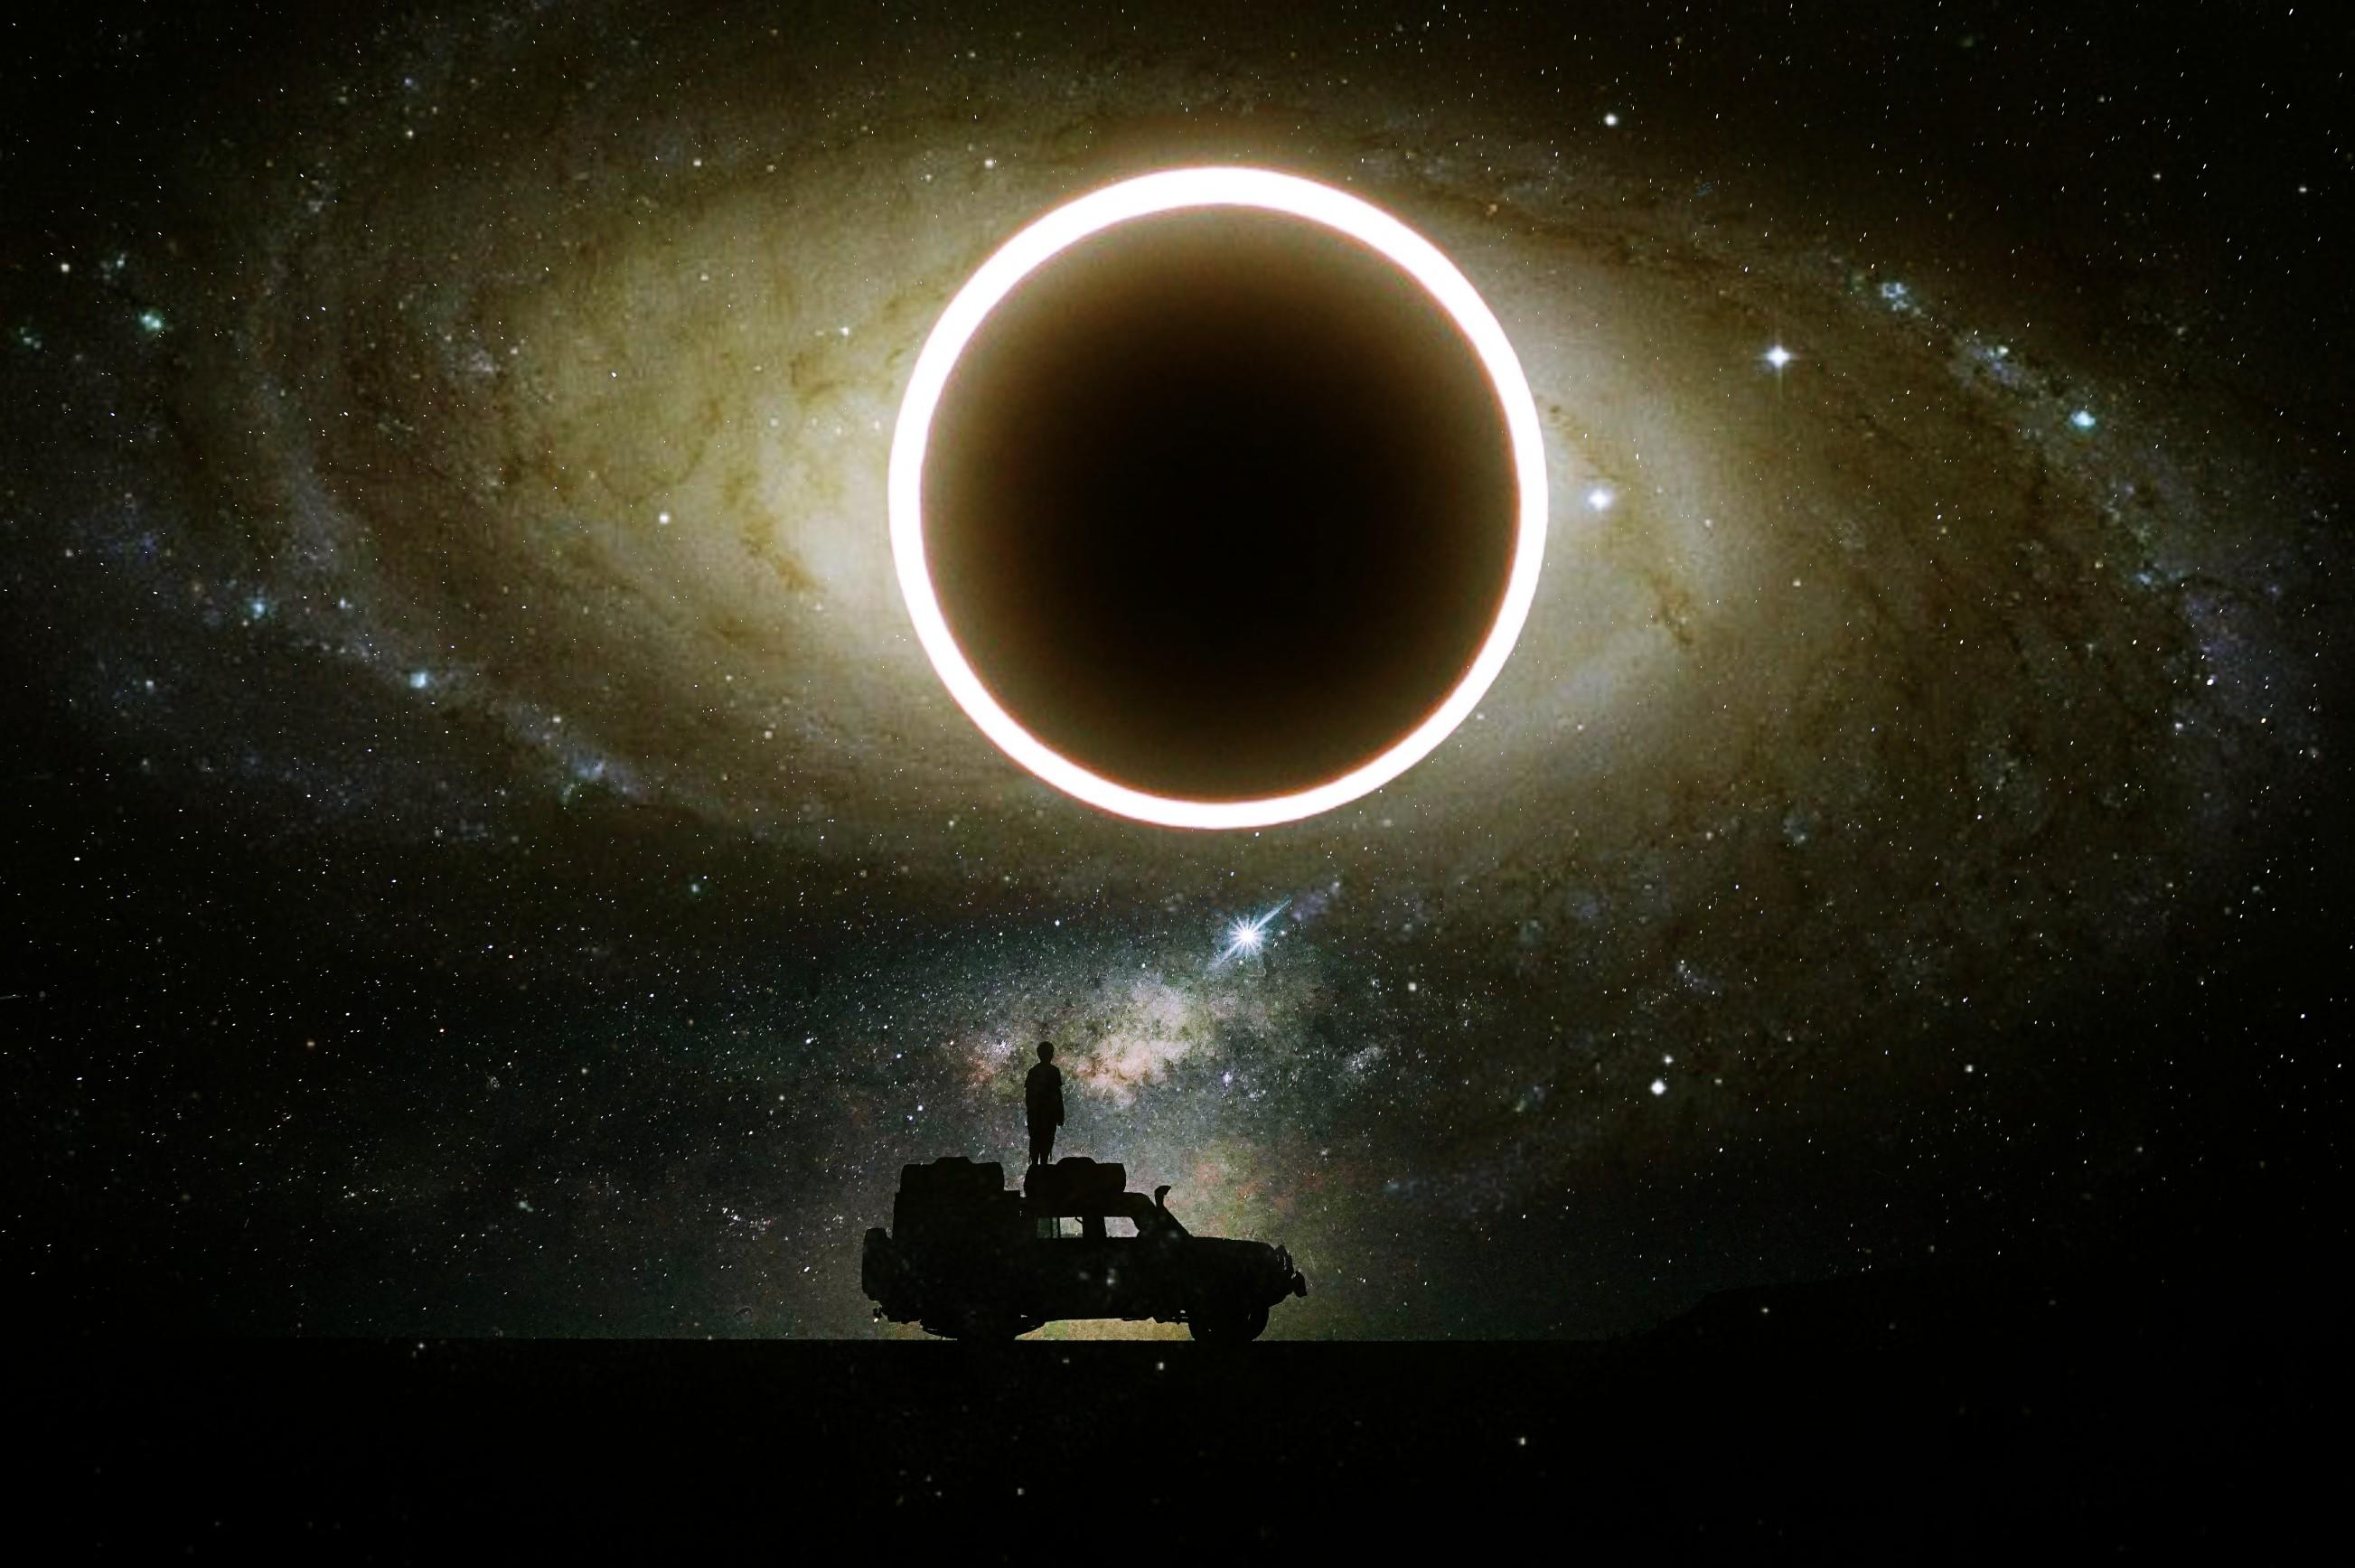 #myremix #eclipse #eclipse2017 #galaxy #cosmos #solareclipseremix #solareclipse #universe #sky #moon #stars